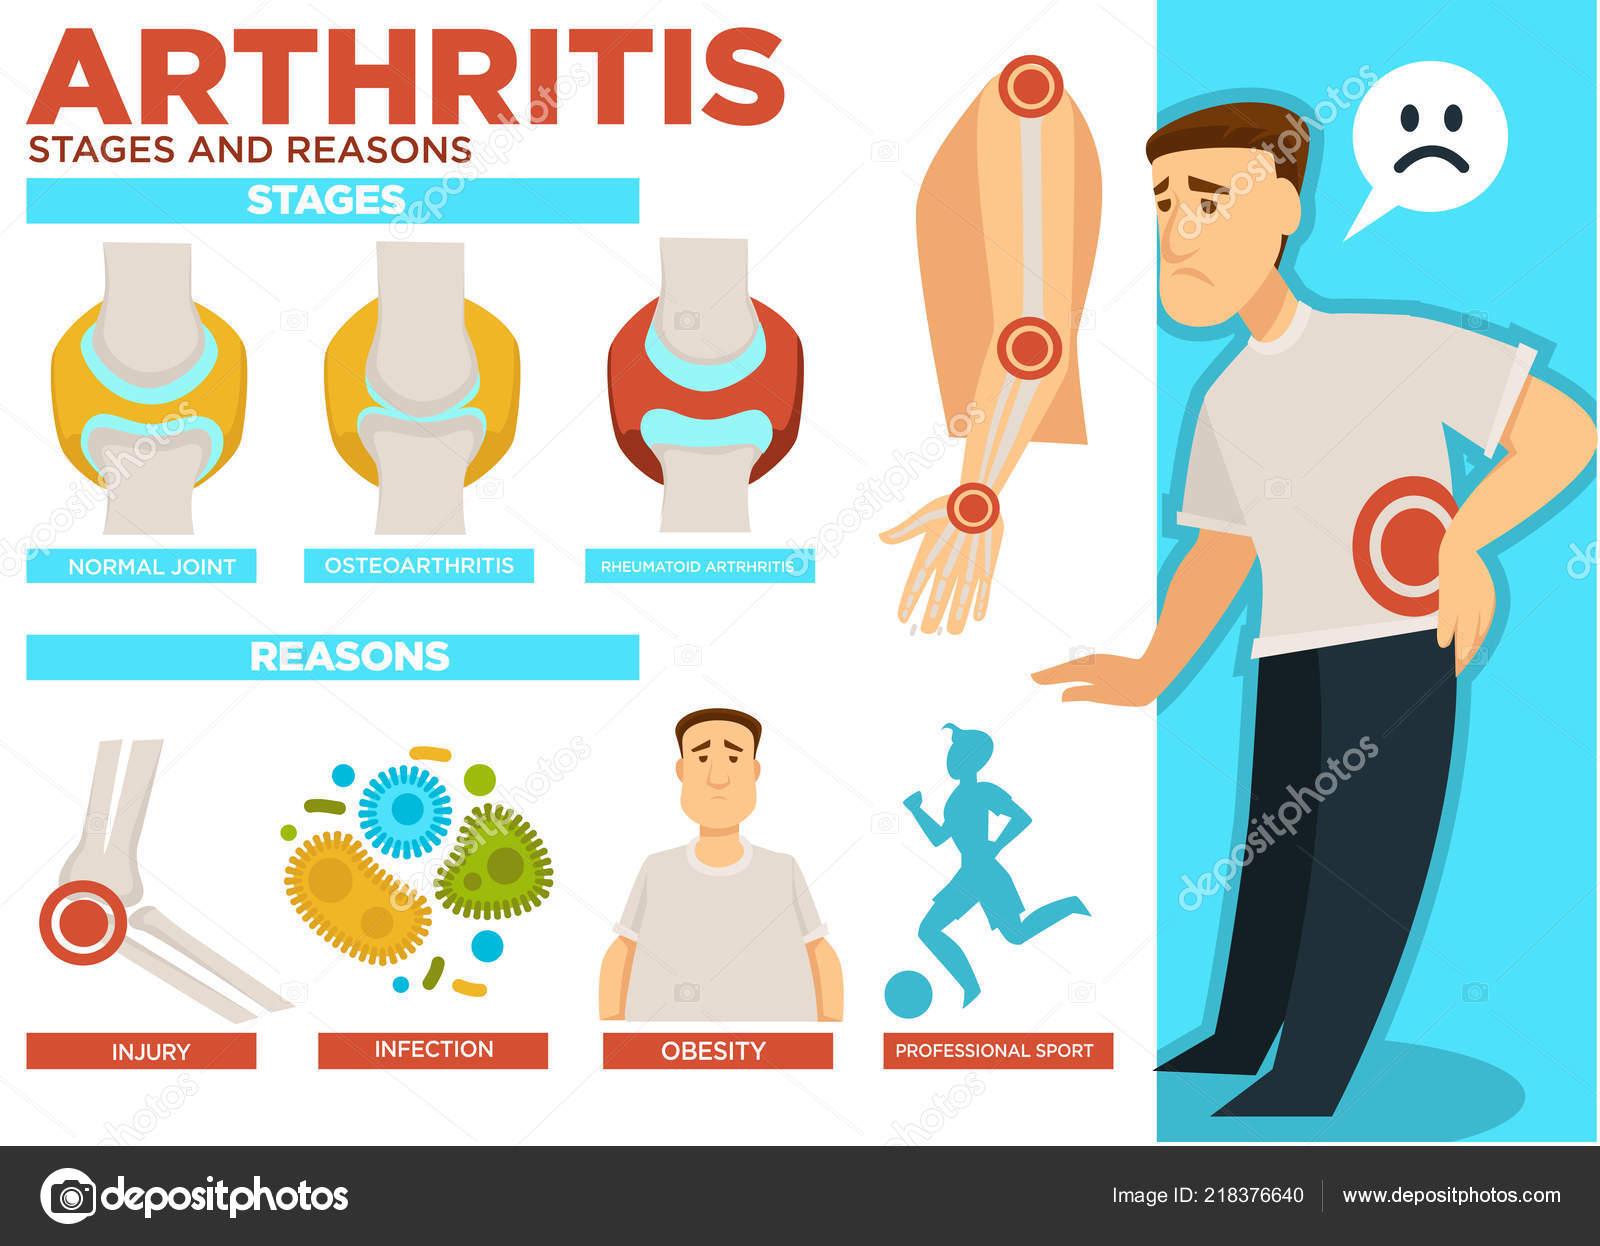 rheumatoid arthritis szakaszai)